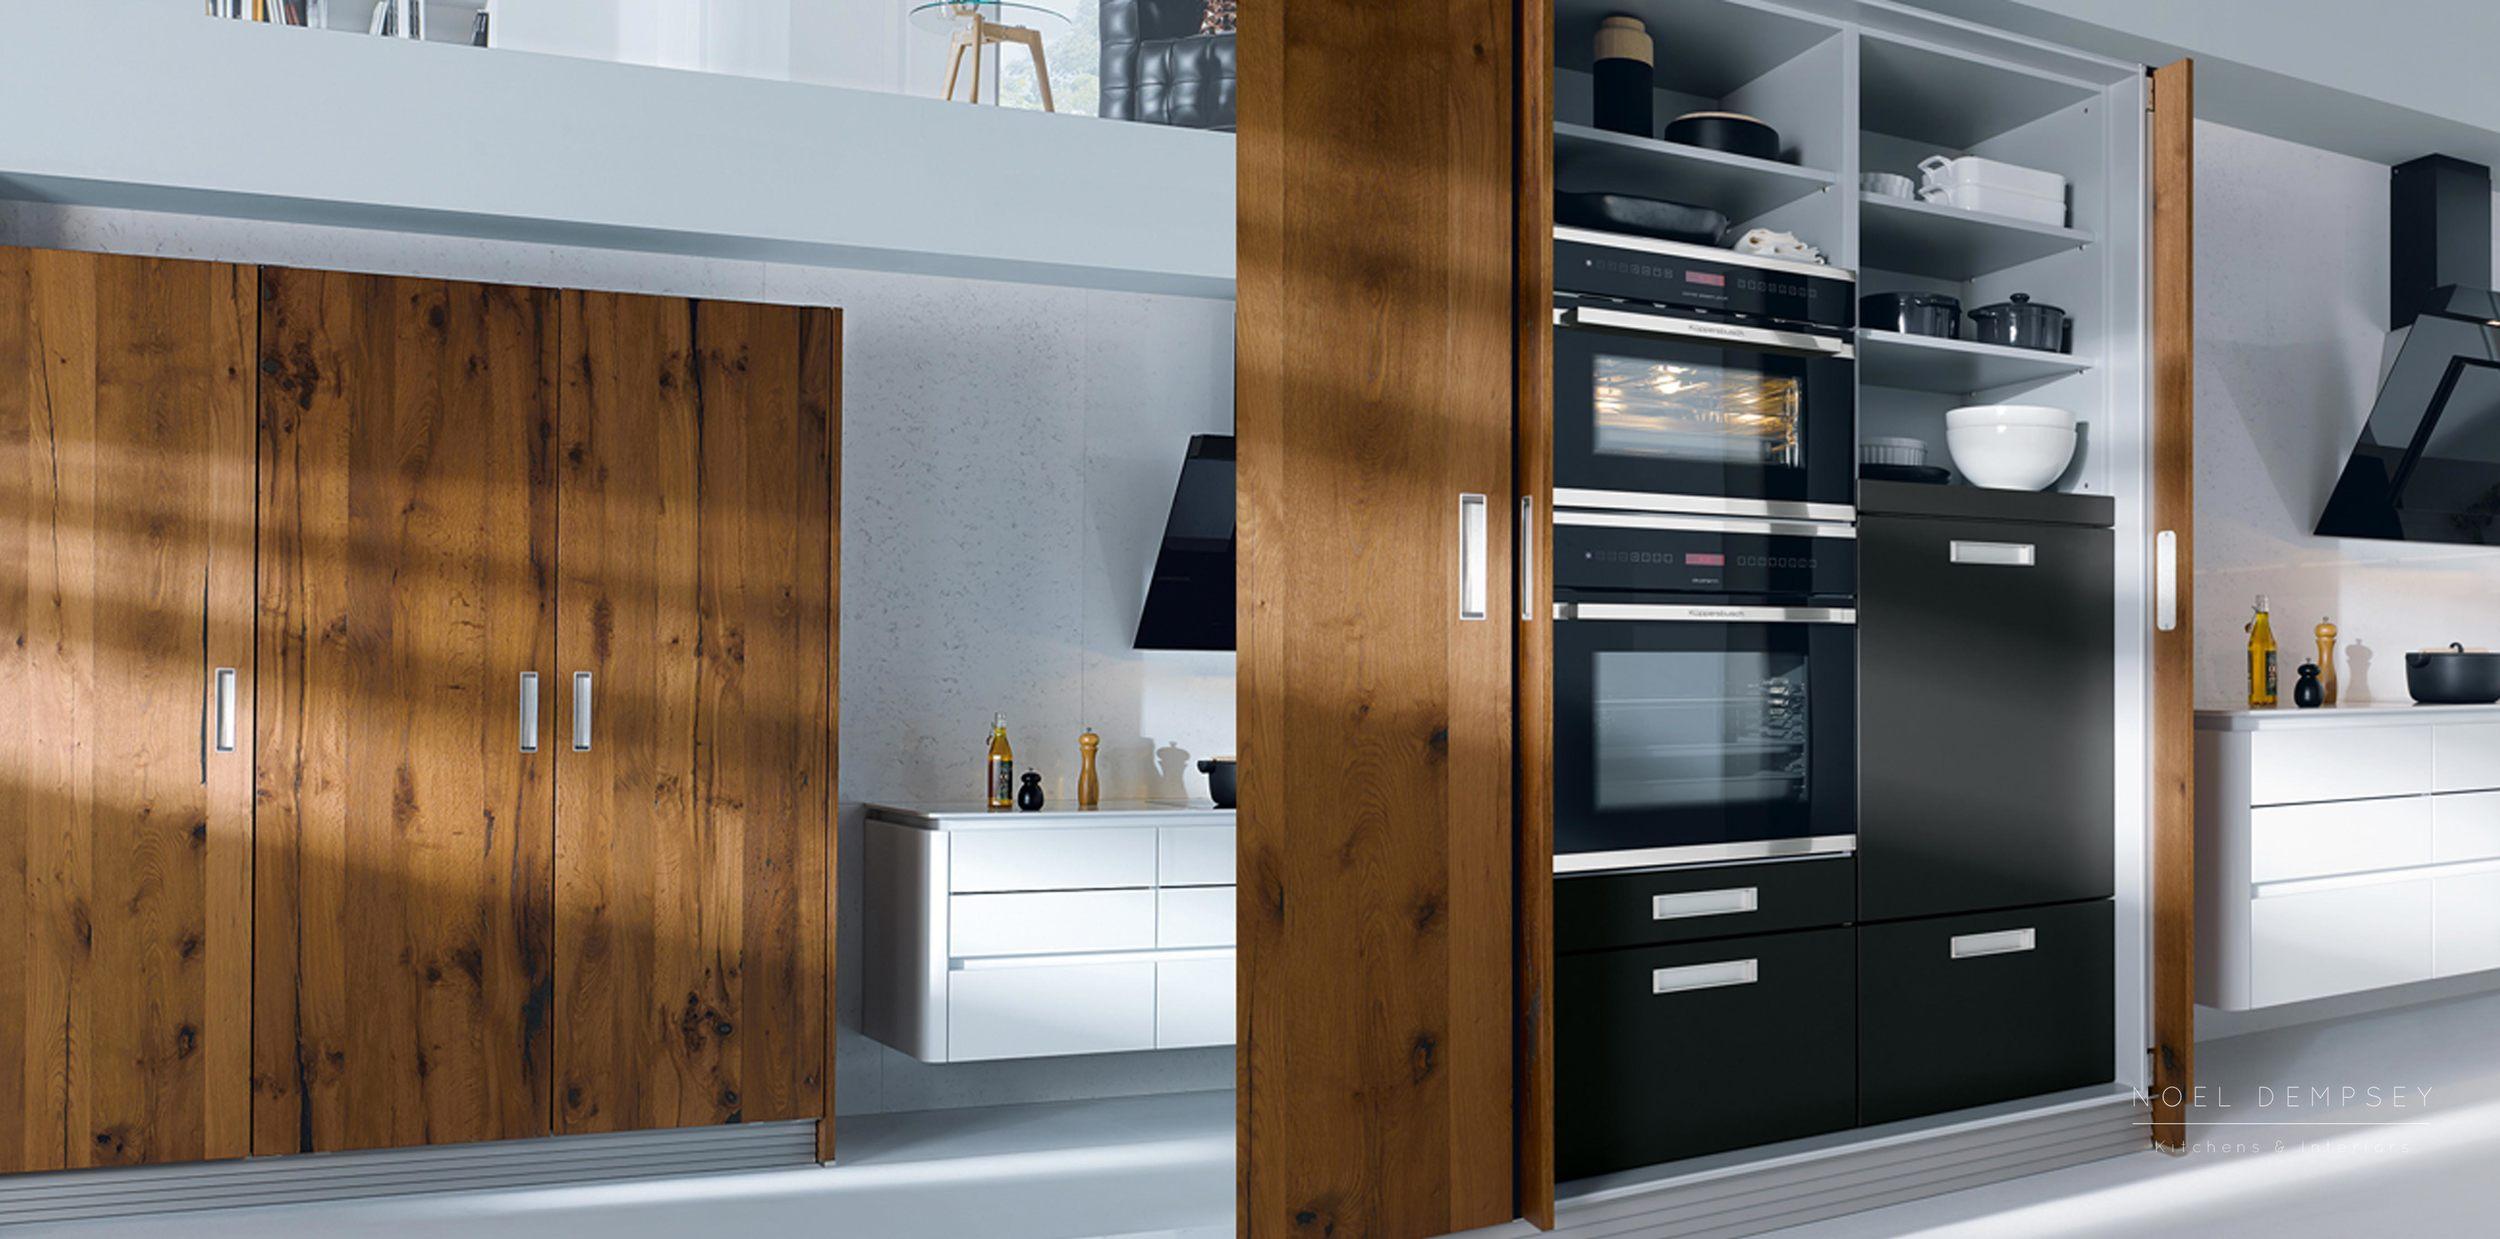 NX501-Crystal-White-Gloss-German-Kitchen-2.jpg